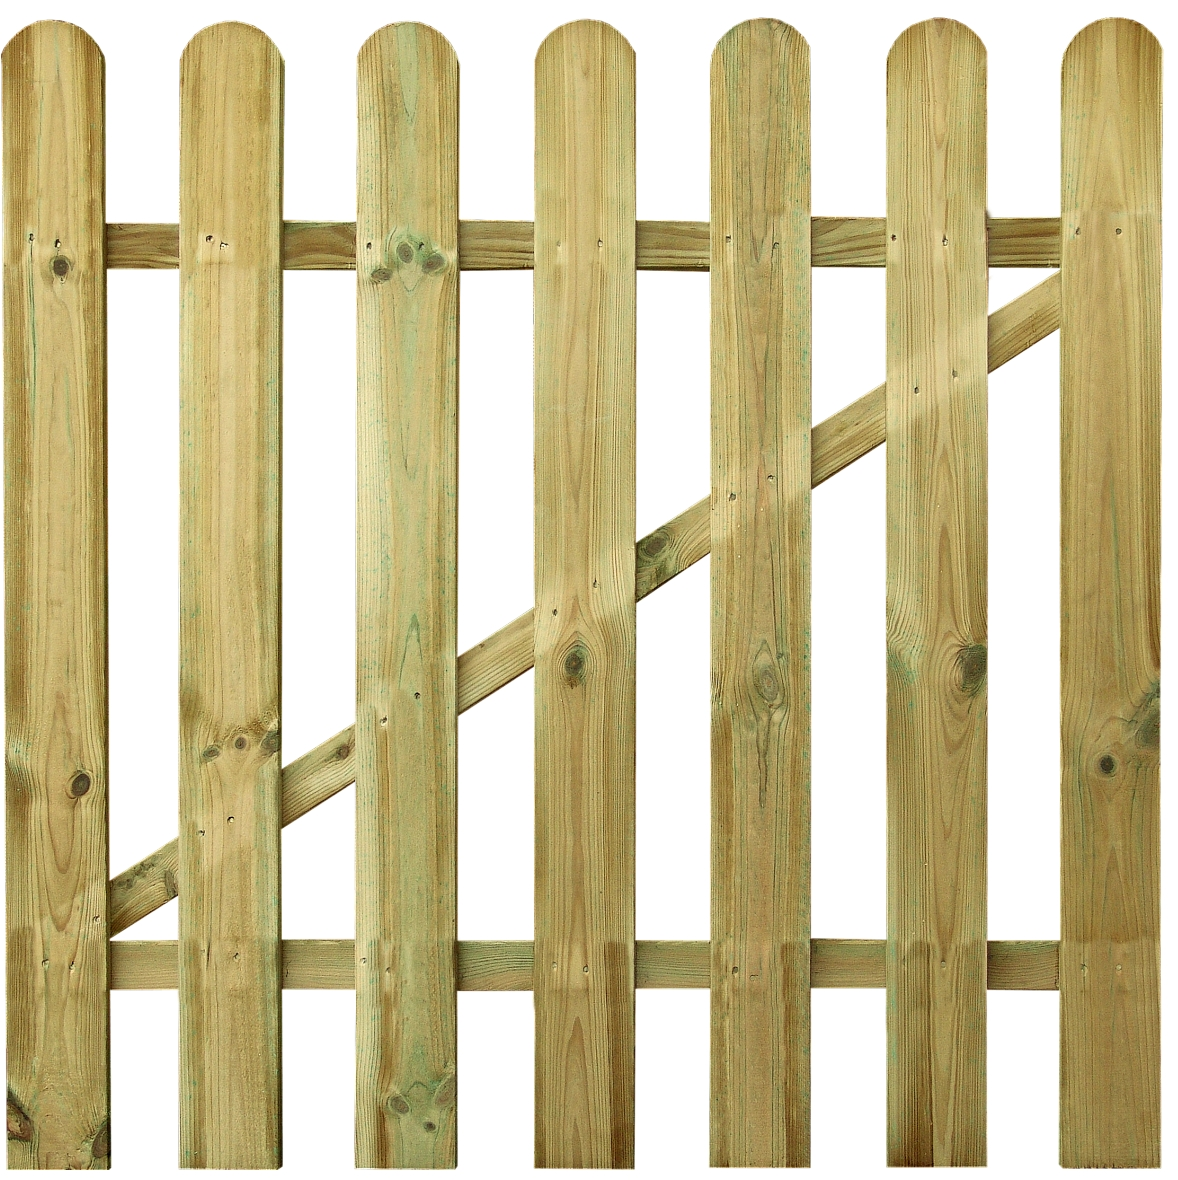 Poortje tuinhek hekwerk 60x100cm